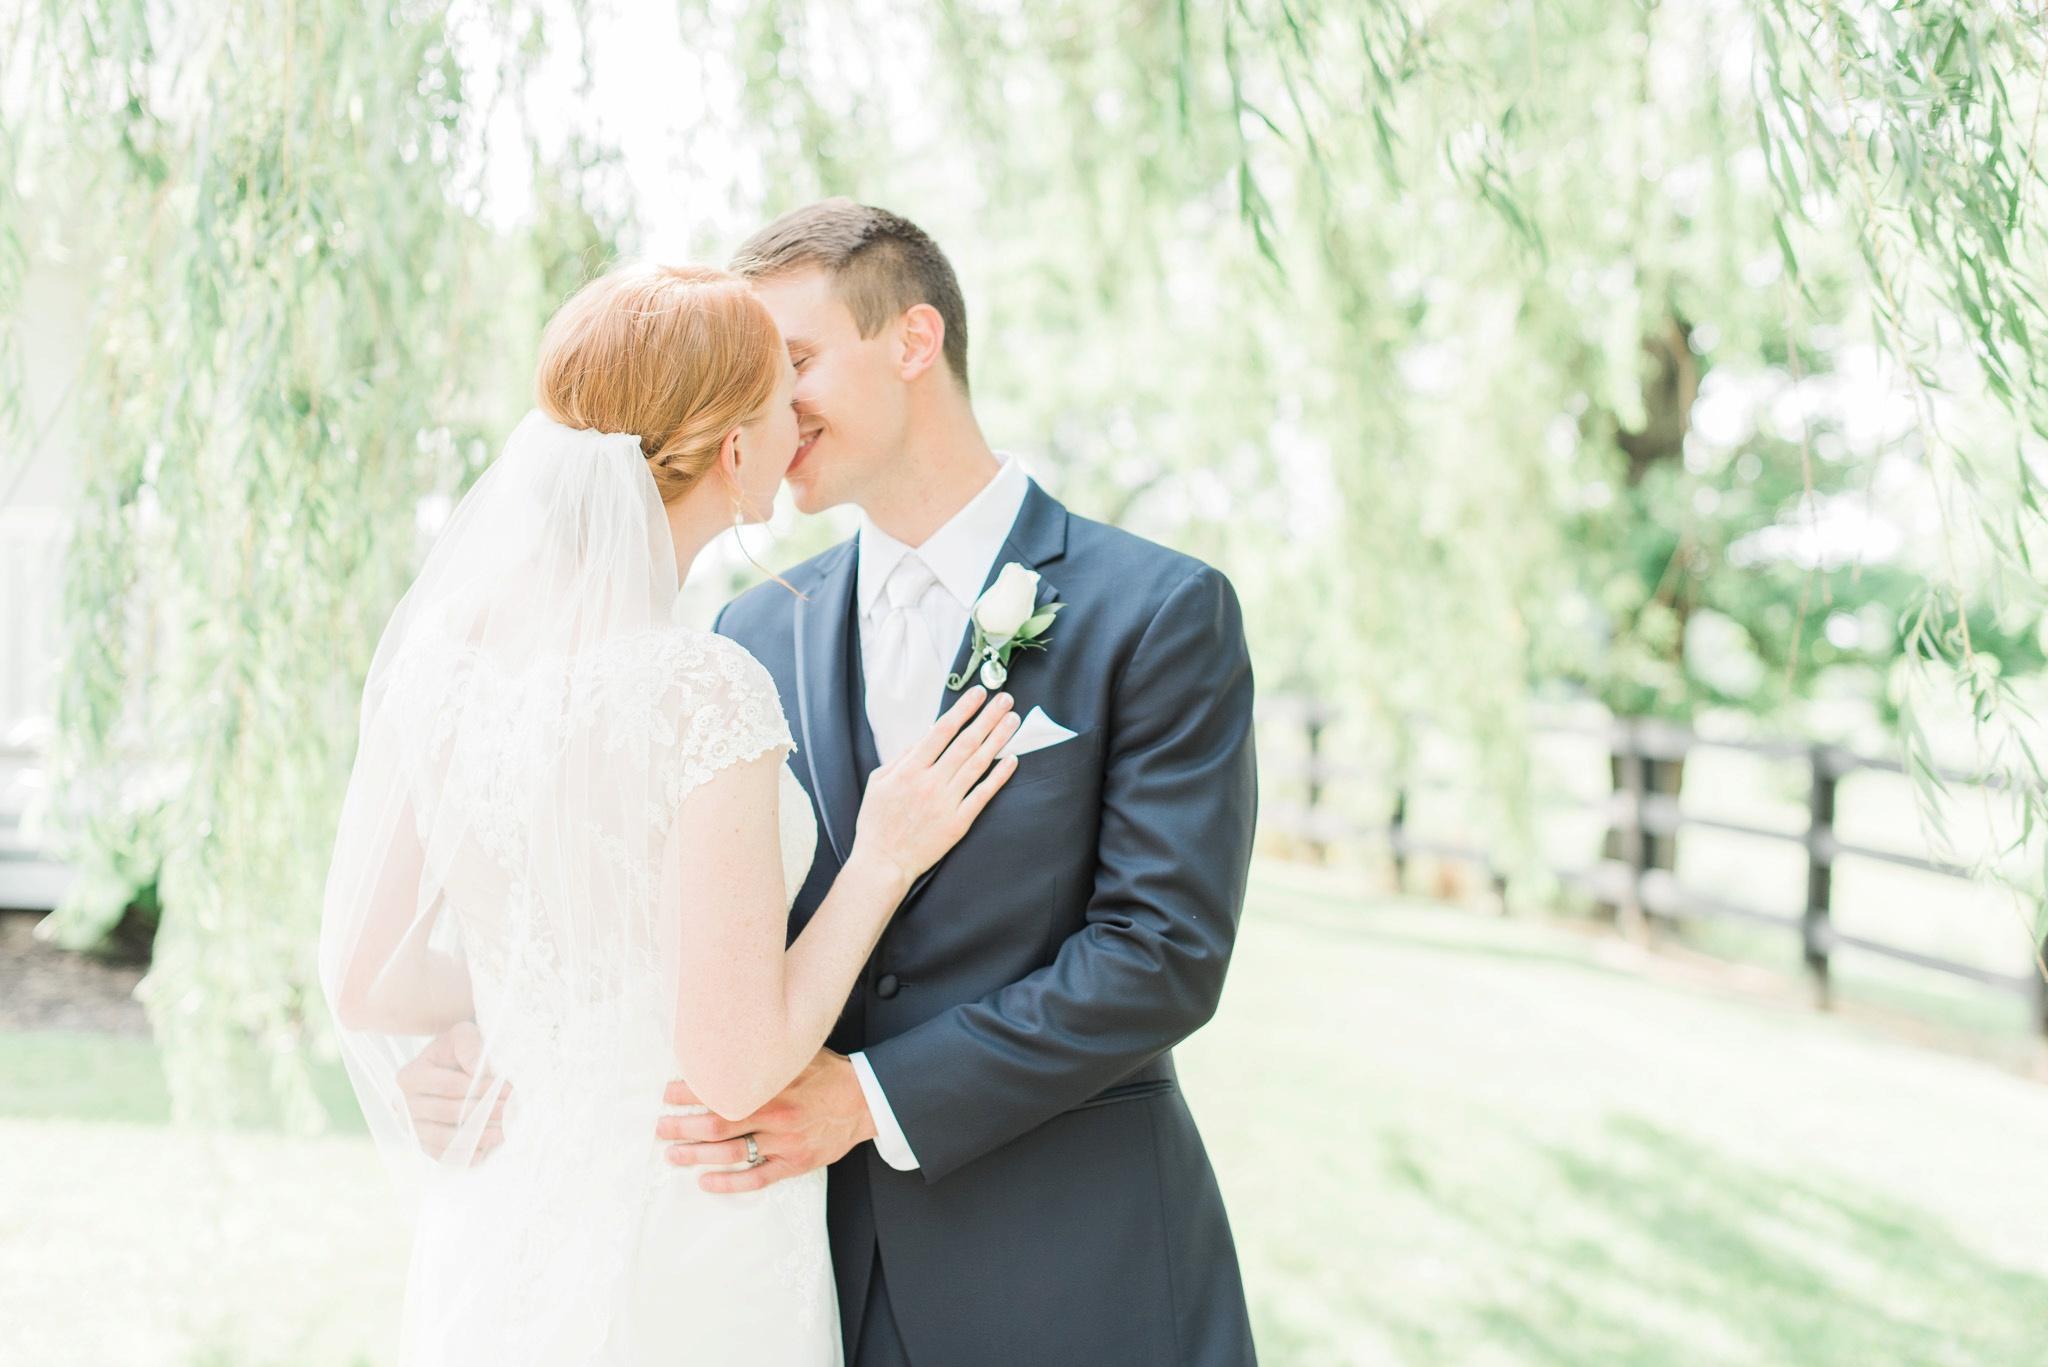 sunbury-ohio-wedding-hannah-johnathan_0081.jpg